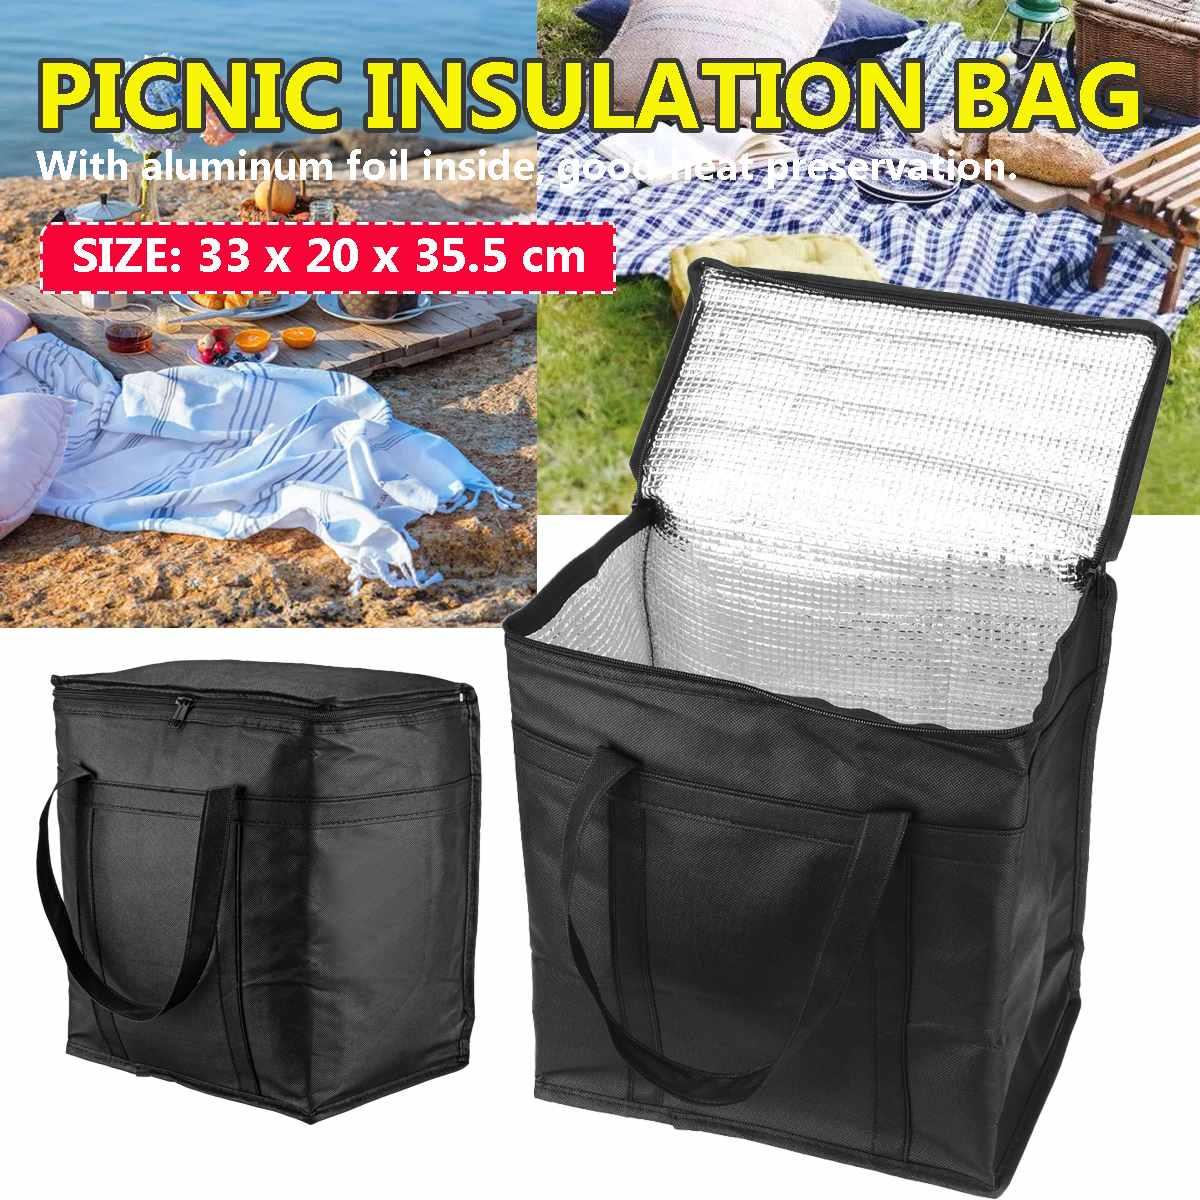 Bolsa aislante para el almuerzo de 23L, bolsa de Picnic plegable portátil, bolso térmico para alimentos, bolsa aislante para el transporte de bebidas